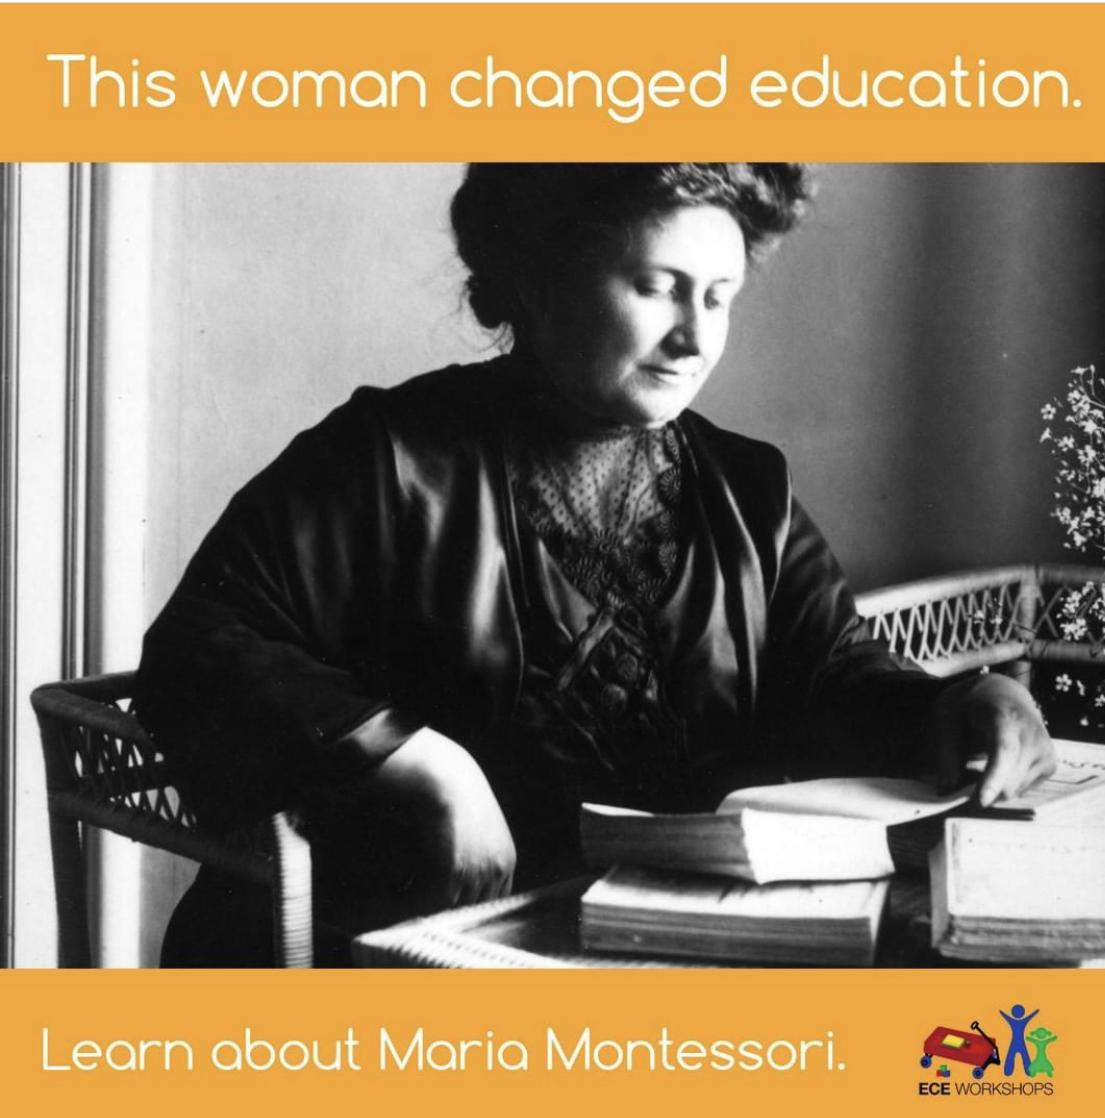 Maria Montessori - This Woman Changed Education